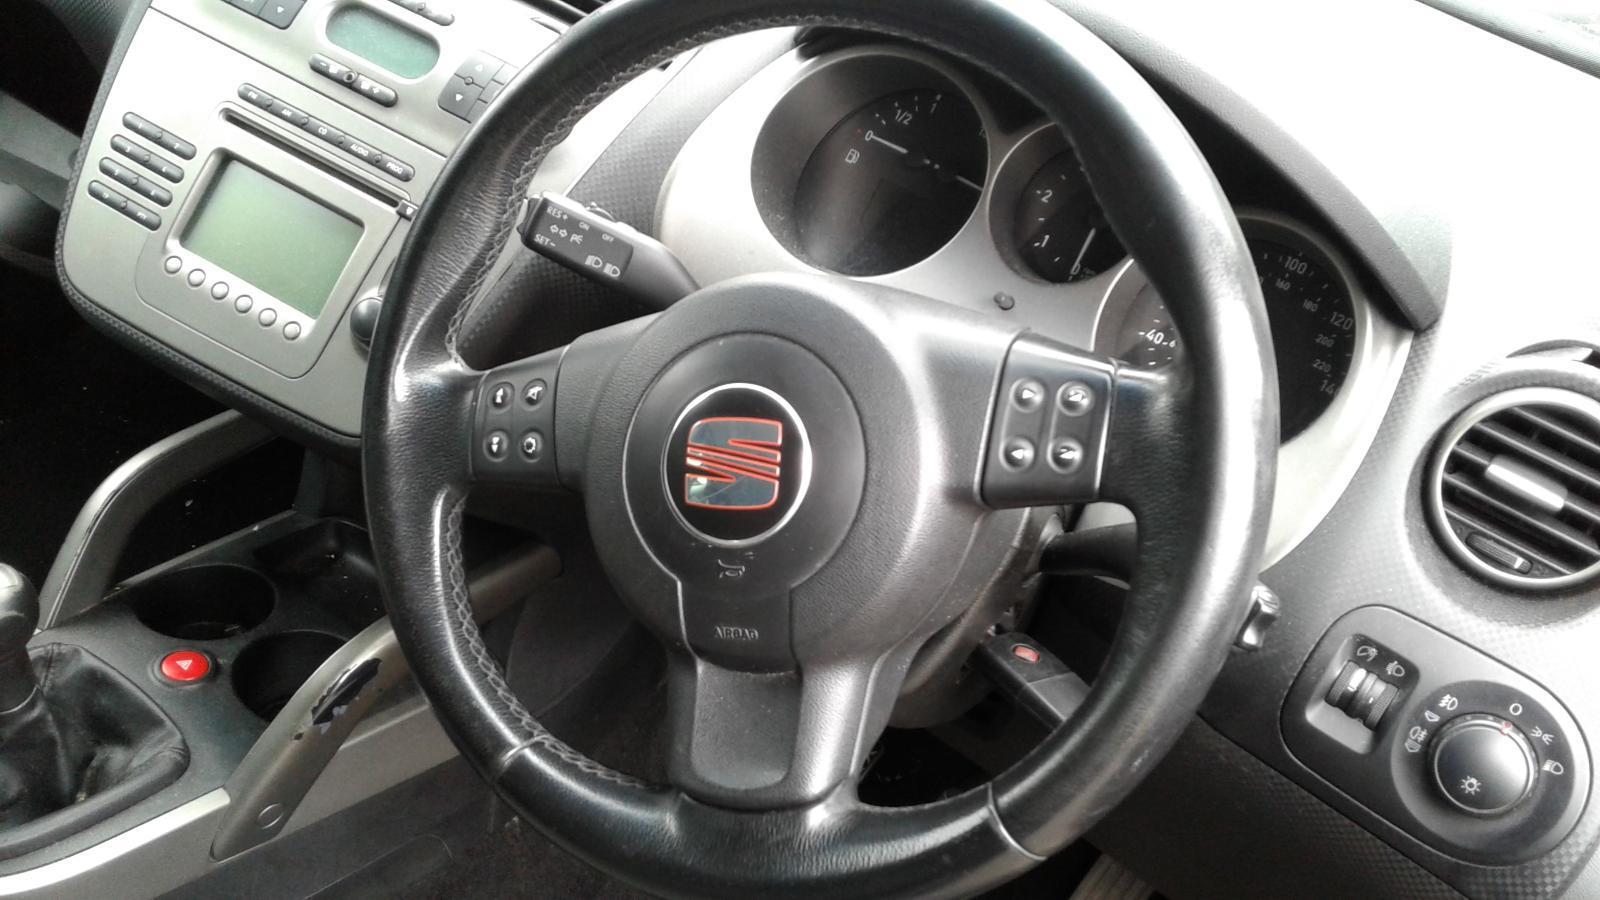 2005 SEAT TOLEDO Image